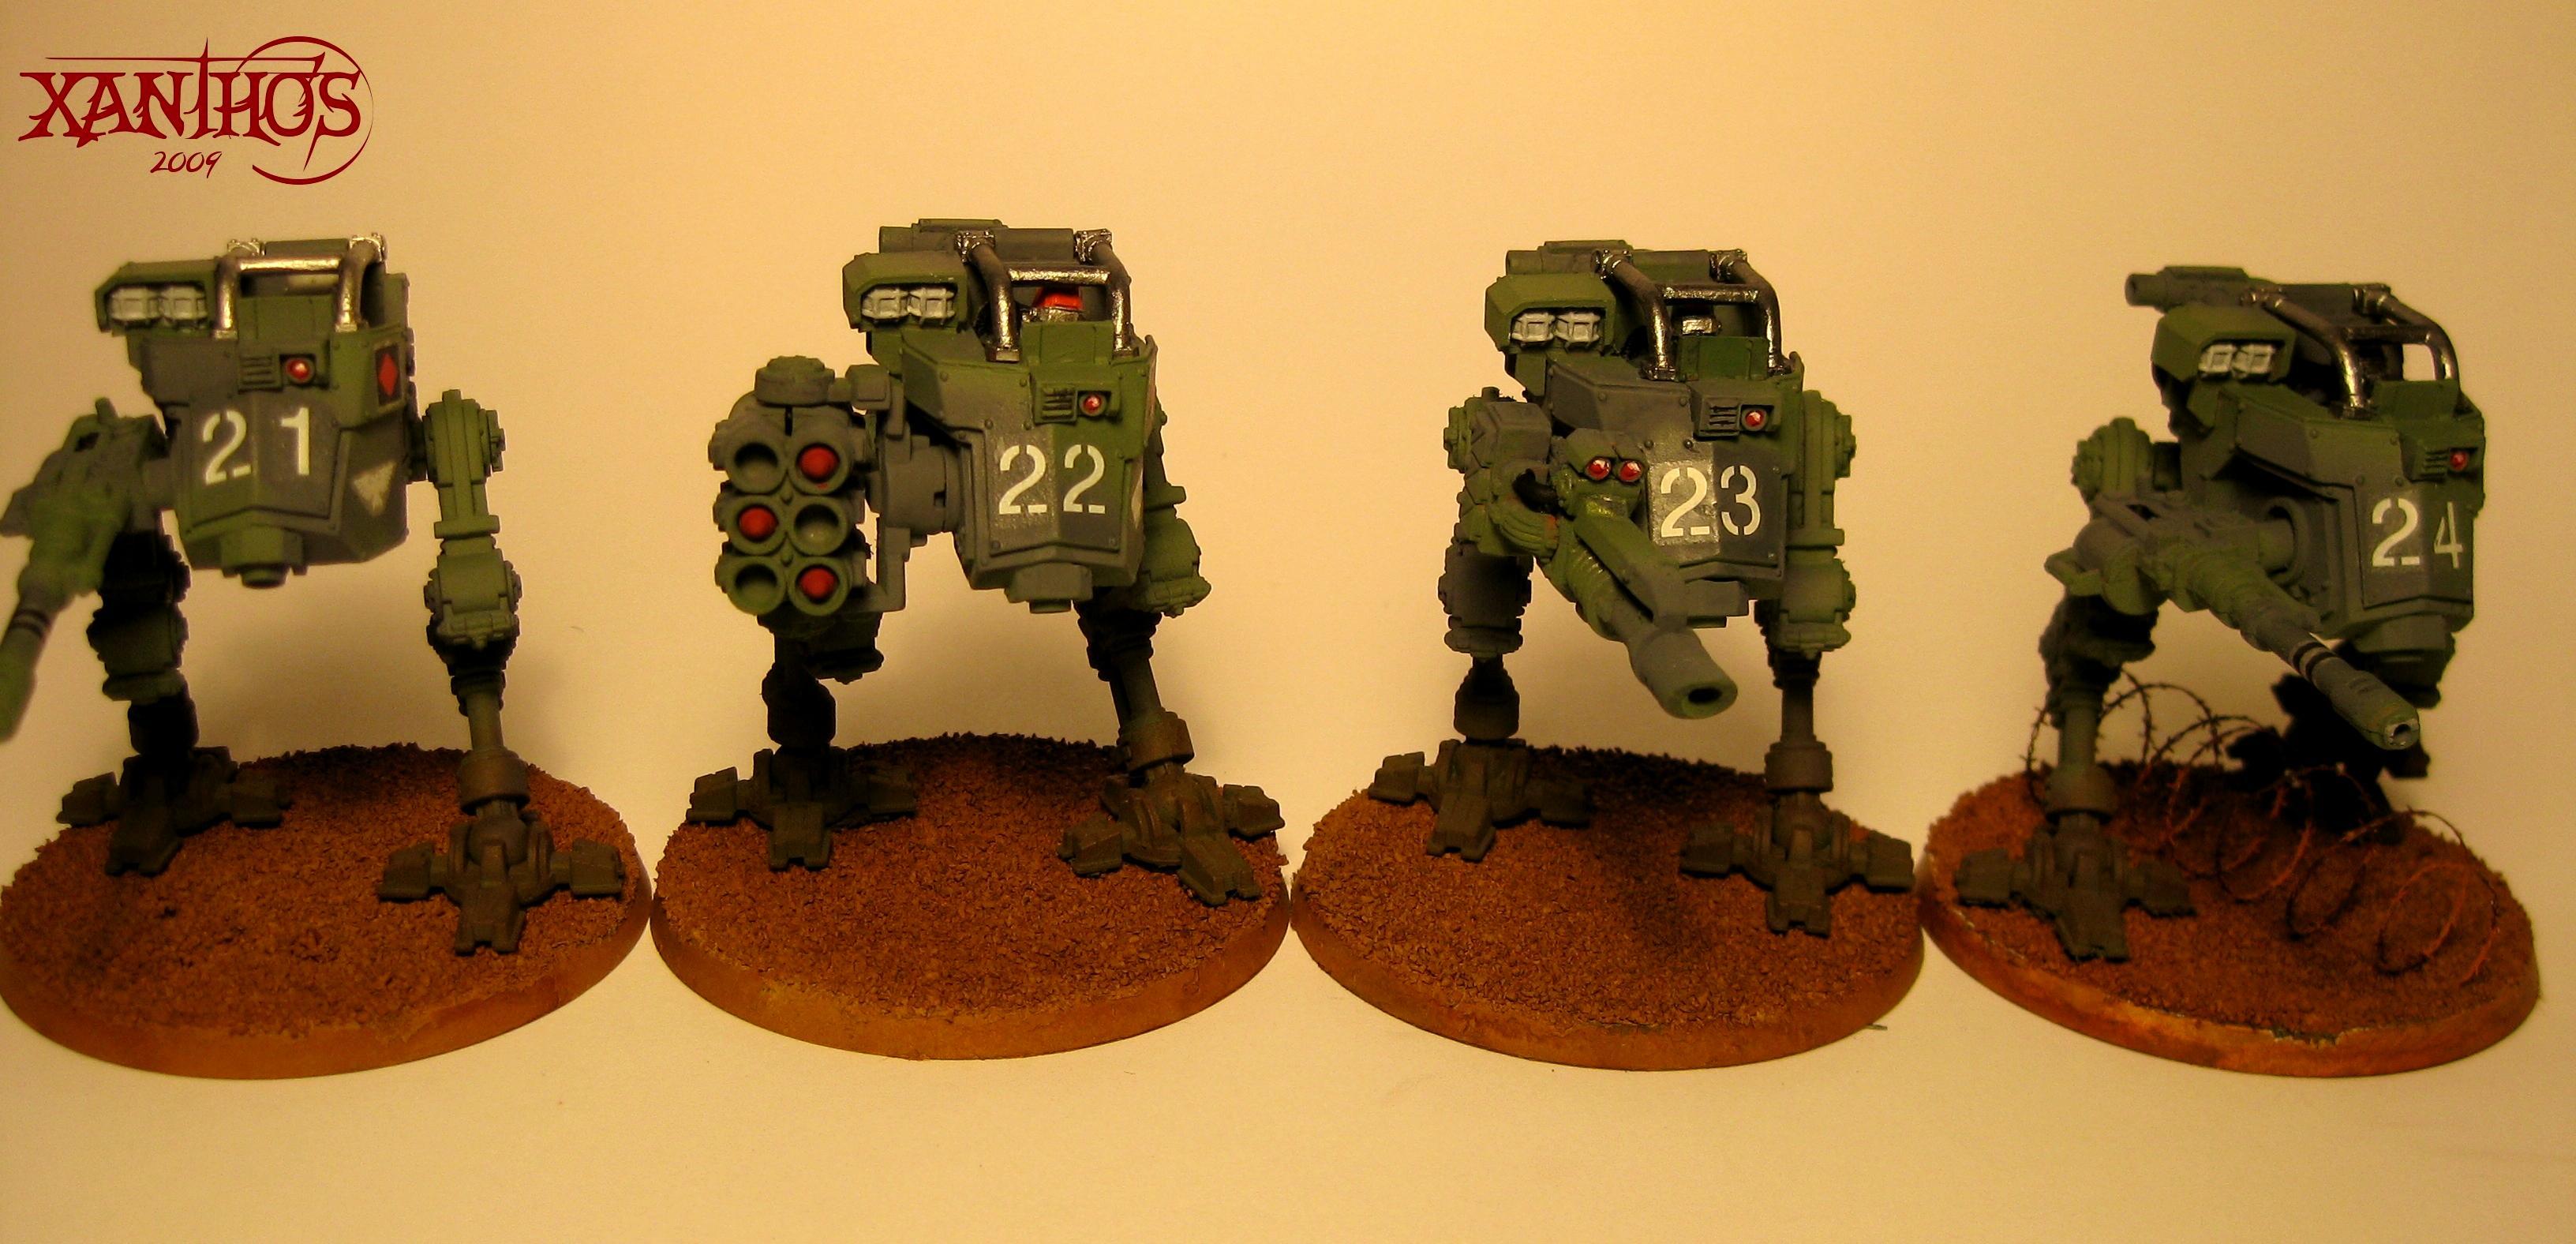 Imperial Guard, Sentinel, Warhammer 40,000